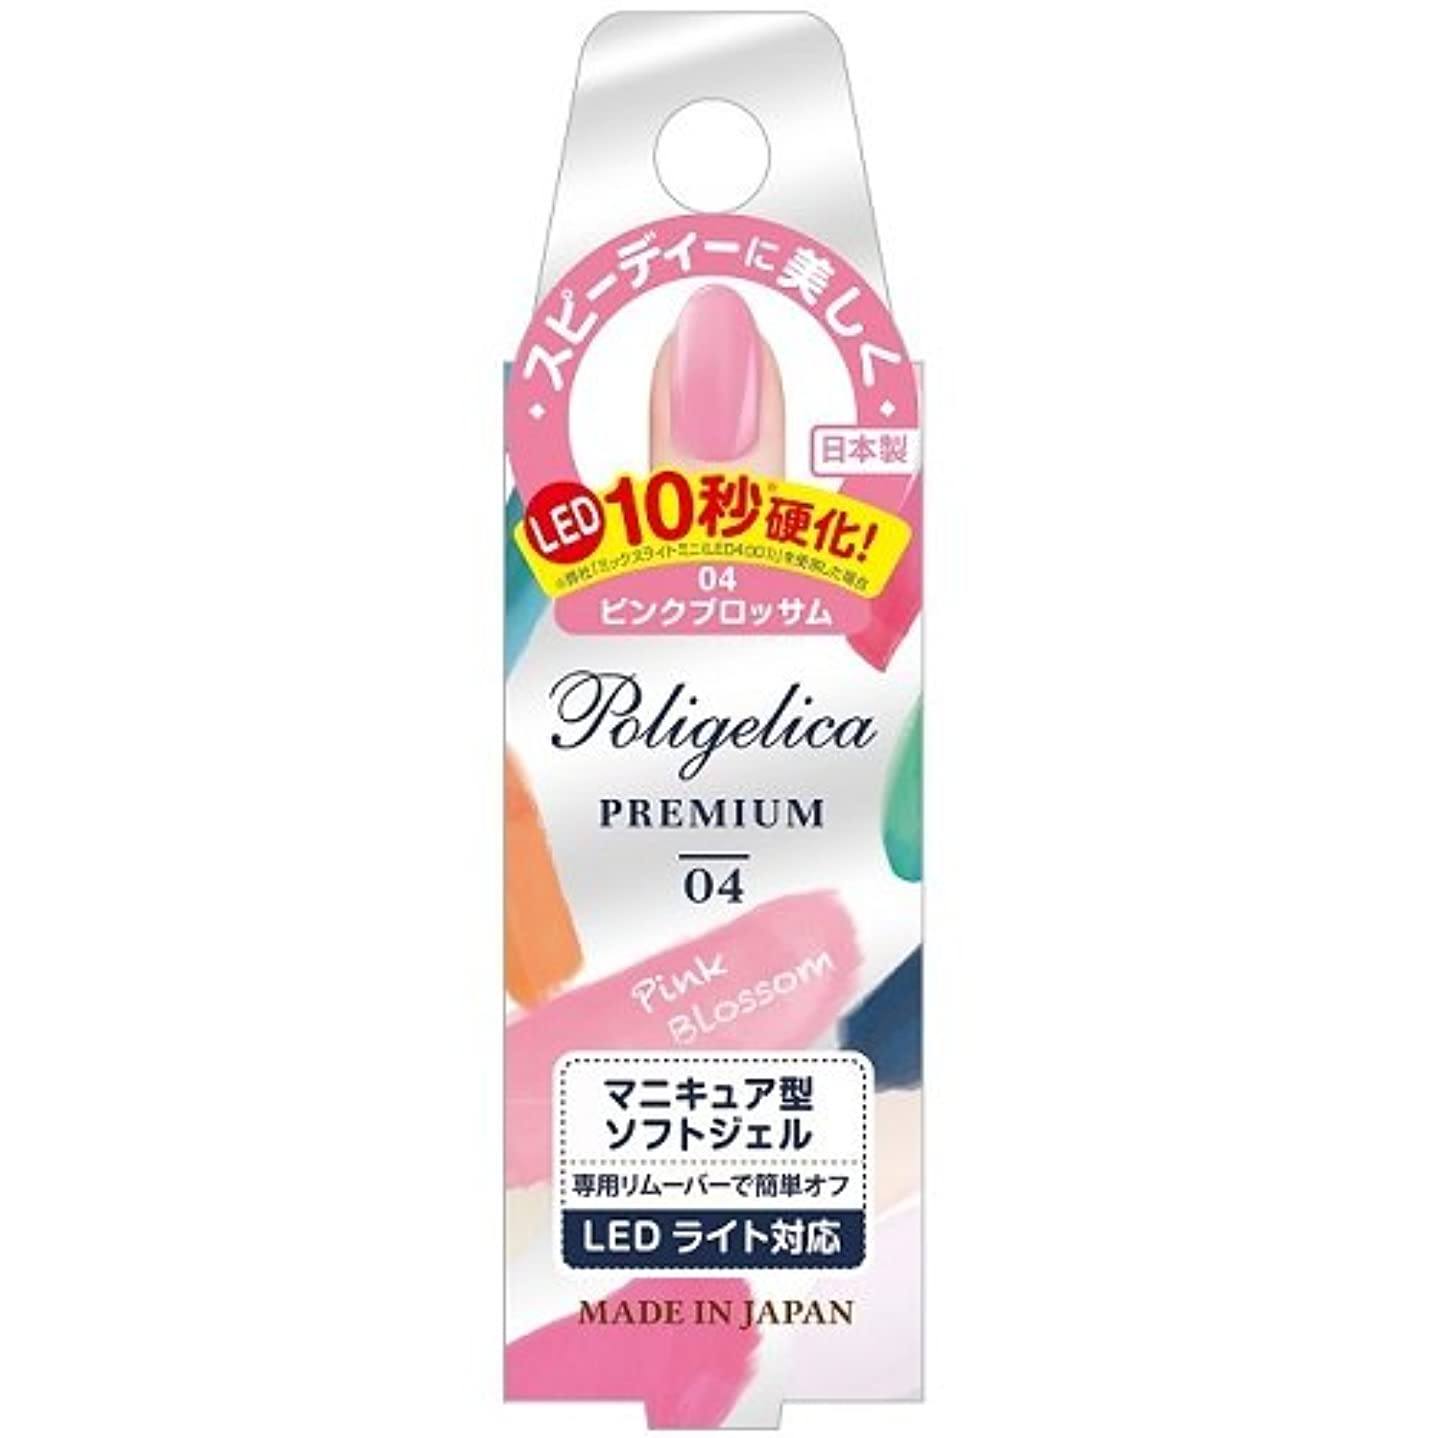 BW ポリジェリカプレミアム カラージェル 1004/ピンクブロッサム (6g)